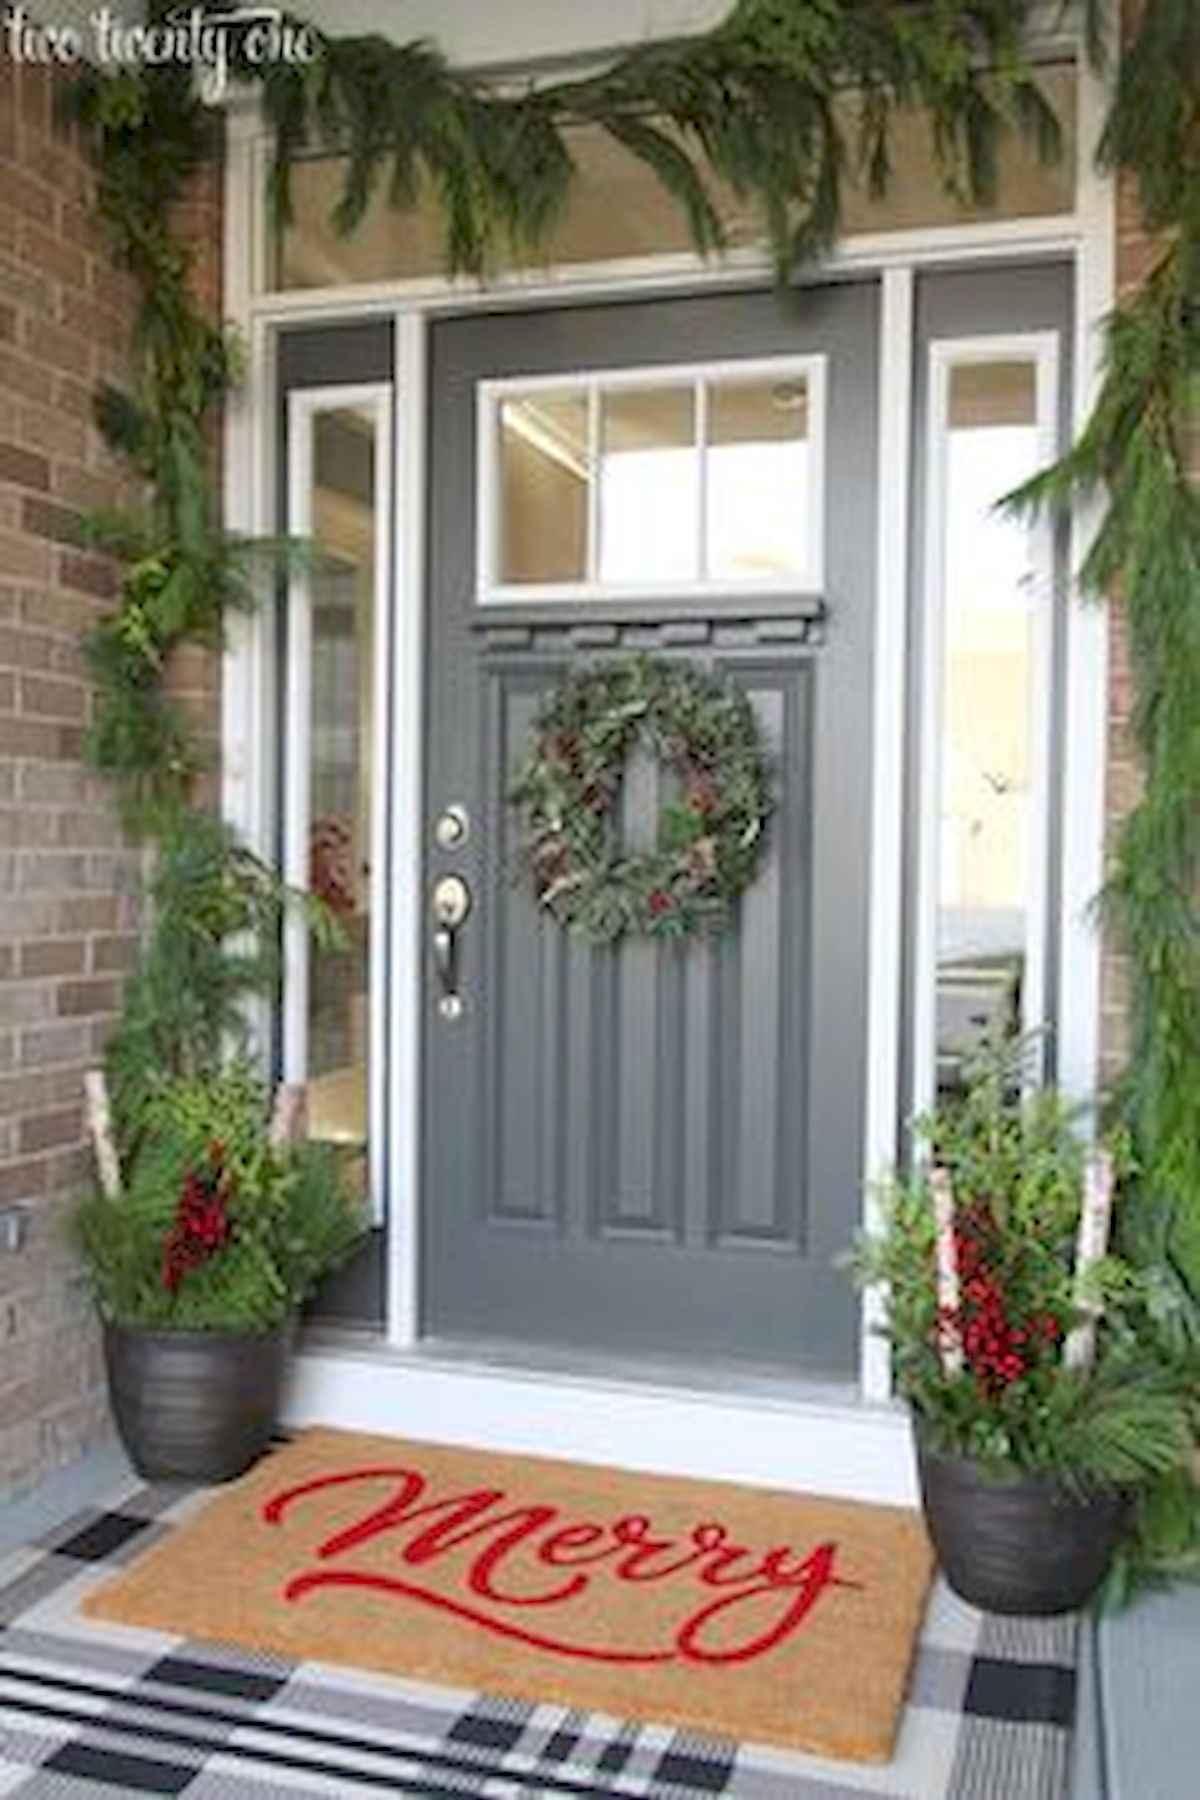 40 amazing outdoor christmas decorations ideas (12)